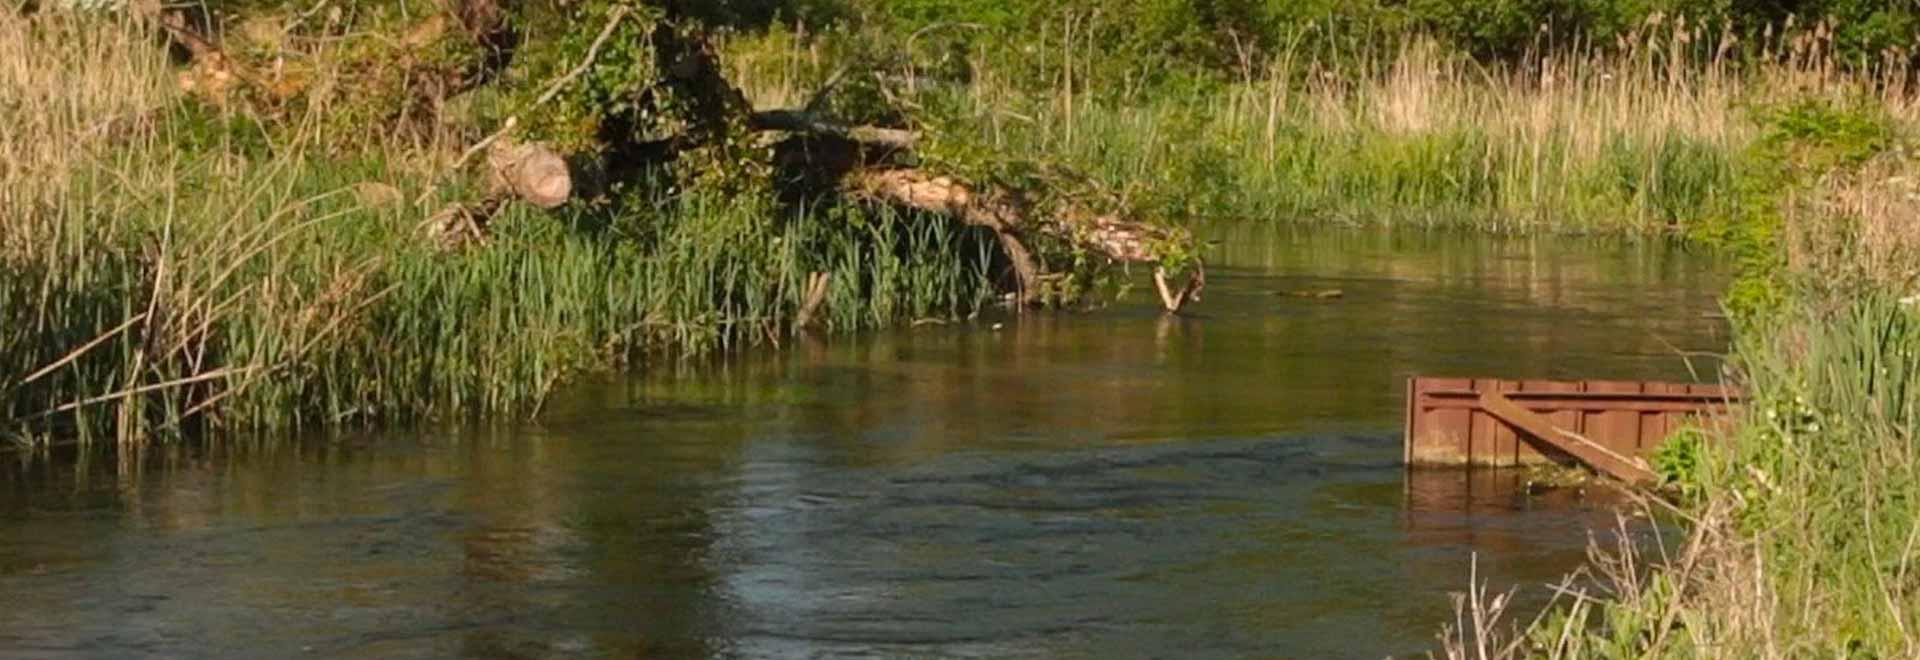 Il fiume Test. 1a parte